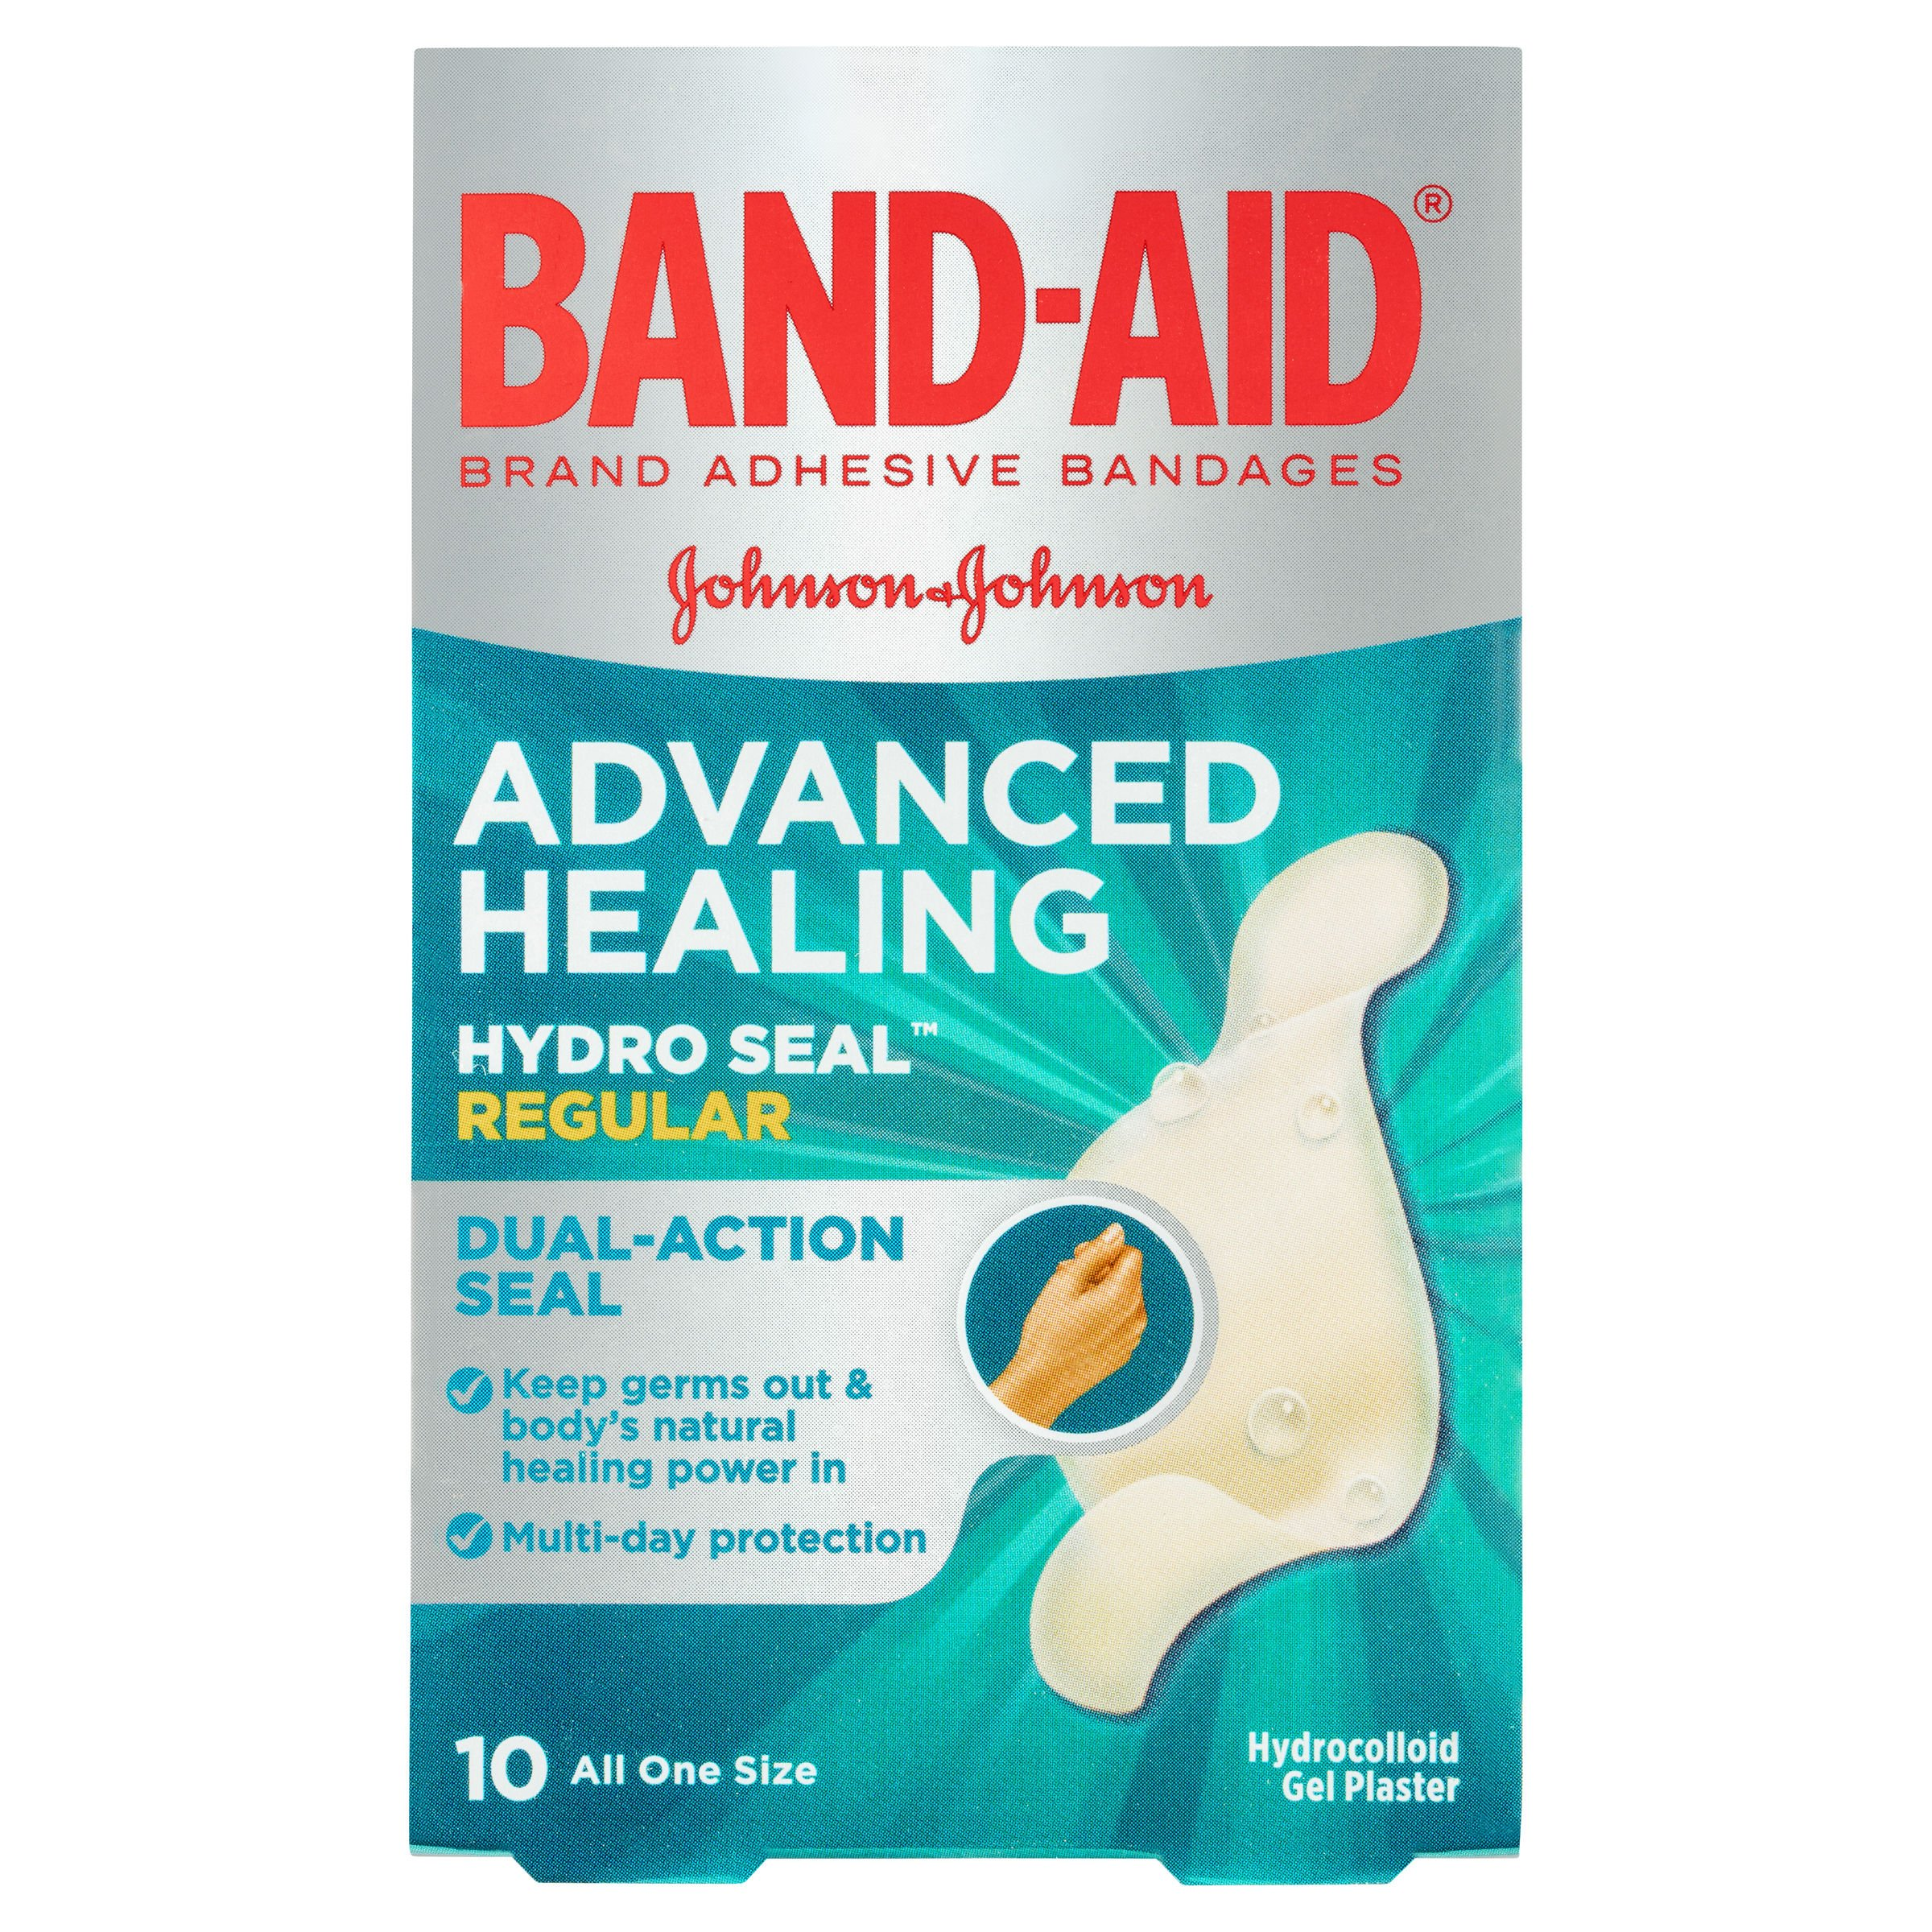 Band-aid Brand Adhesive Bandages Activ-Flex Regular, 10 Count Box